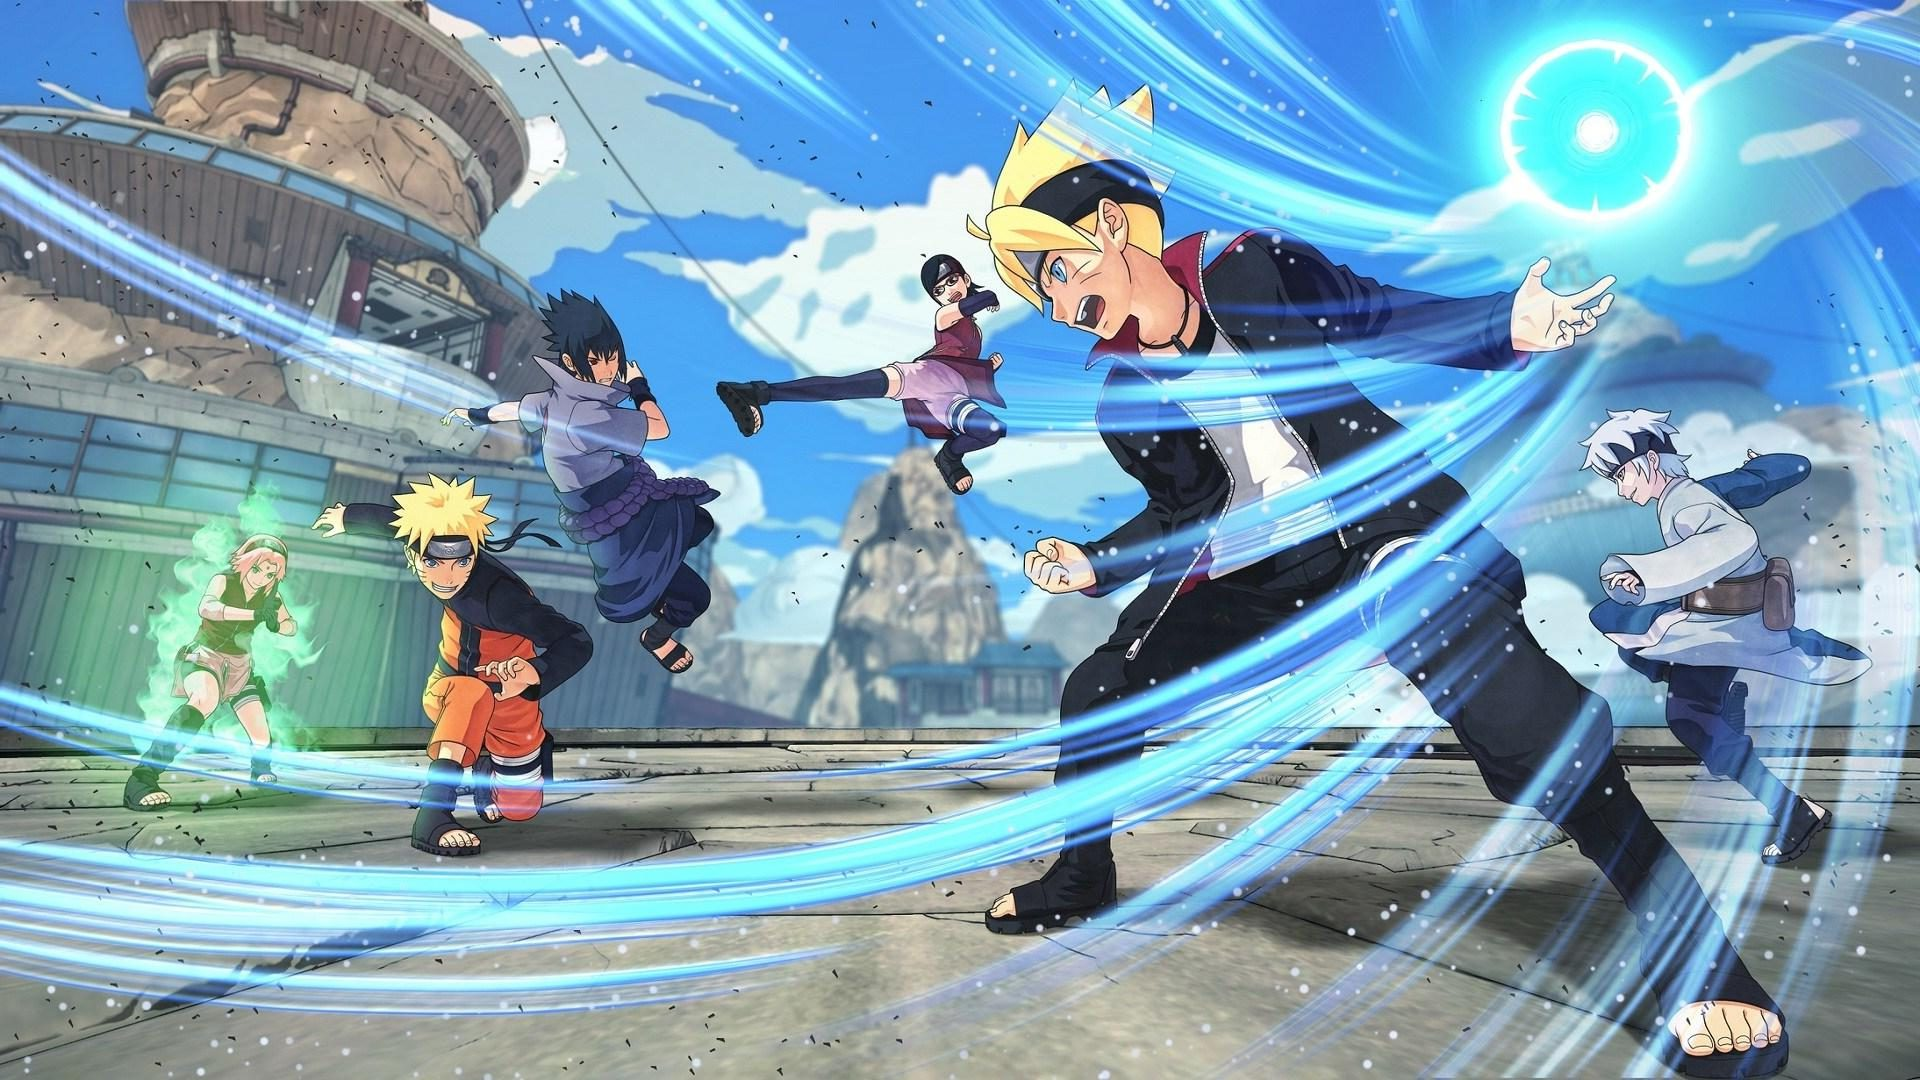 Boruto: Naruto Next Generations Episode 208